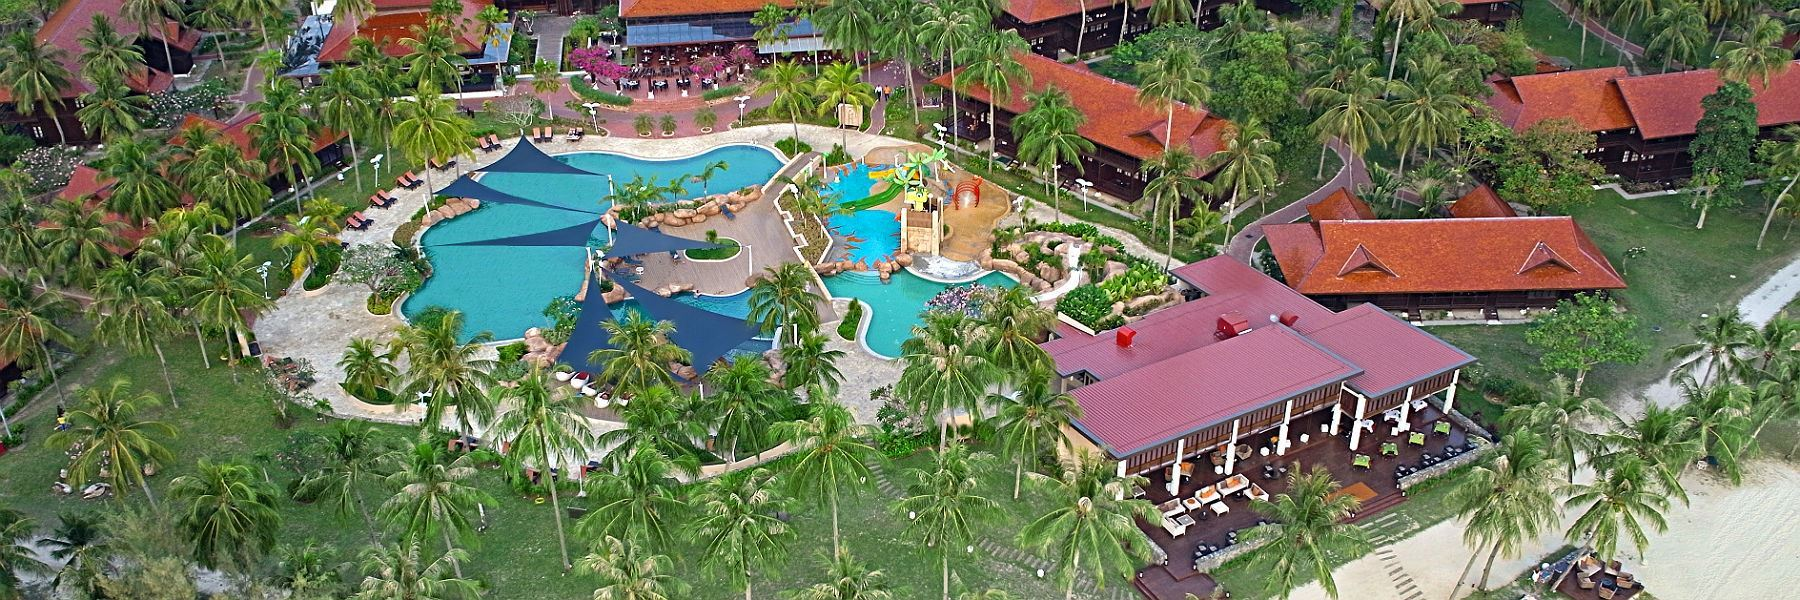 Pelangi Beach Resort Spa Langkawi Book Now With Tropical Sky